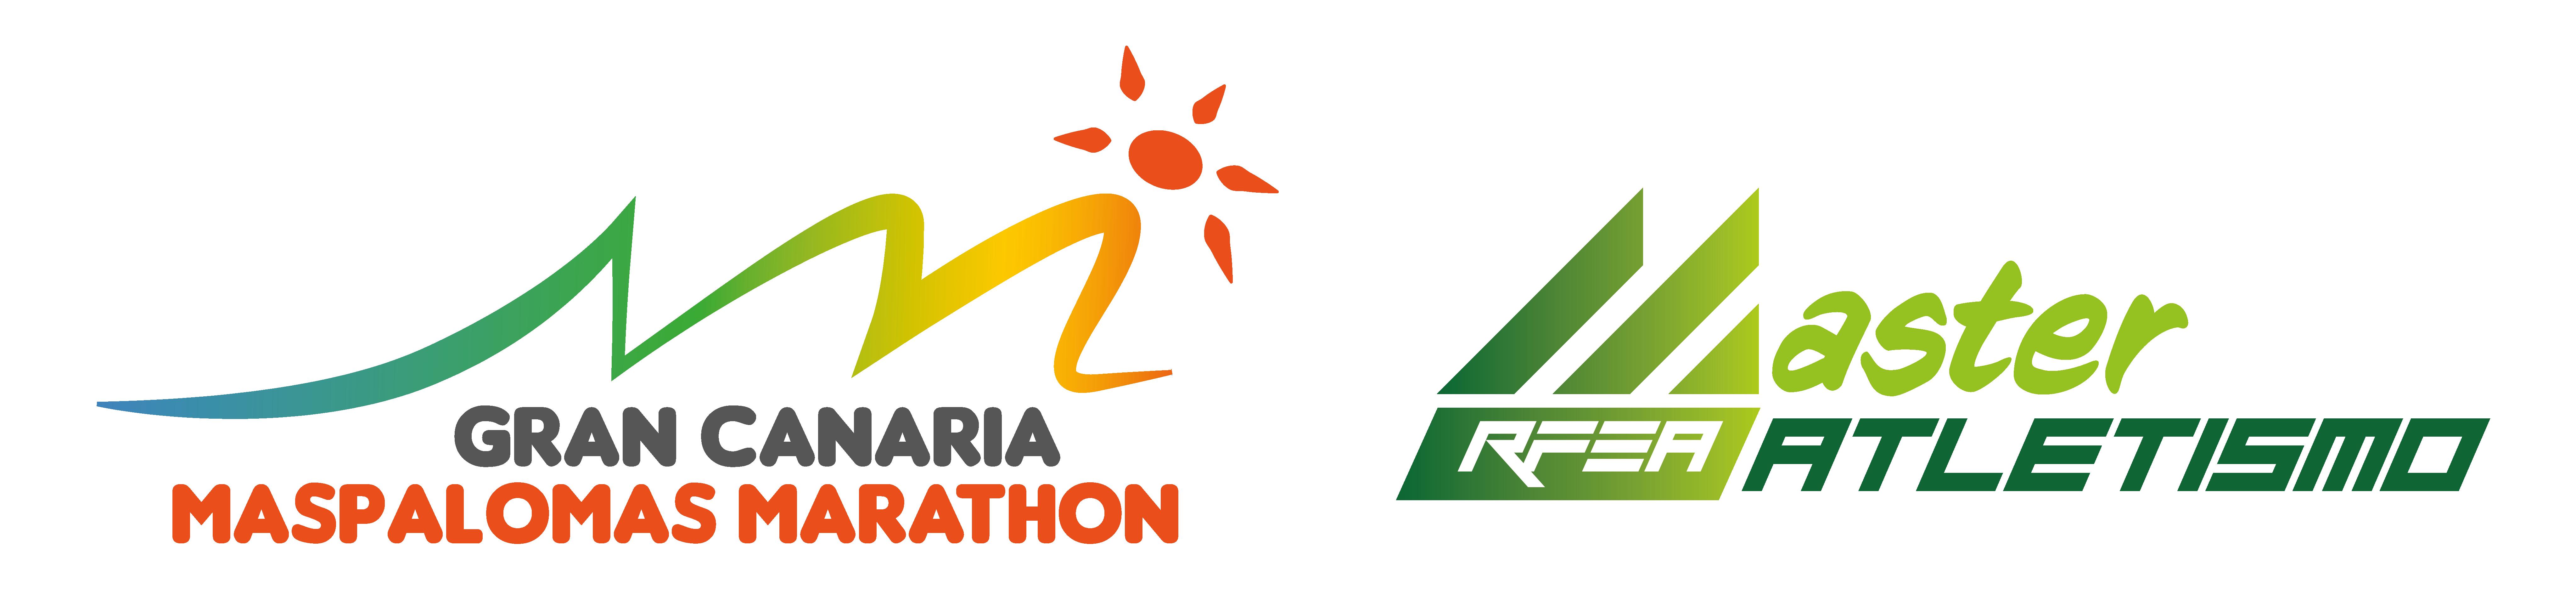 Gran Canaria - Maspalomas Marathon